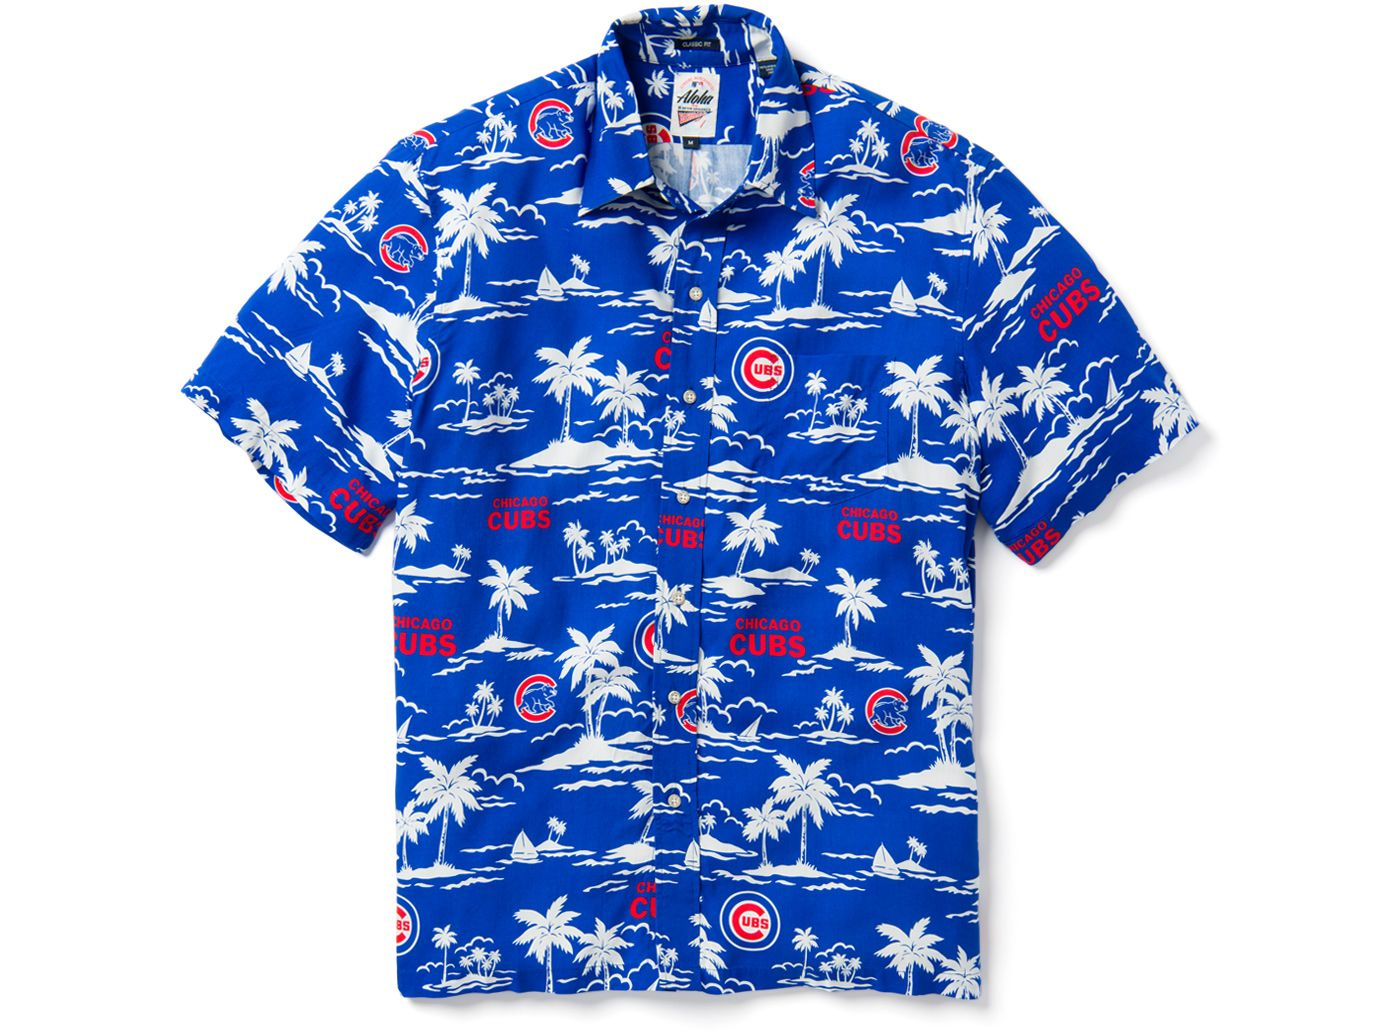 Reyn Spooner Men's Chicago Cubs Vintage Rayon Button-Down Shirt